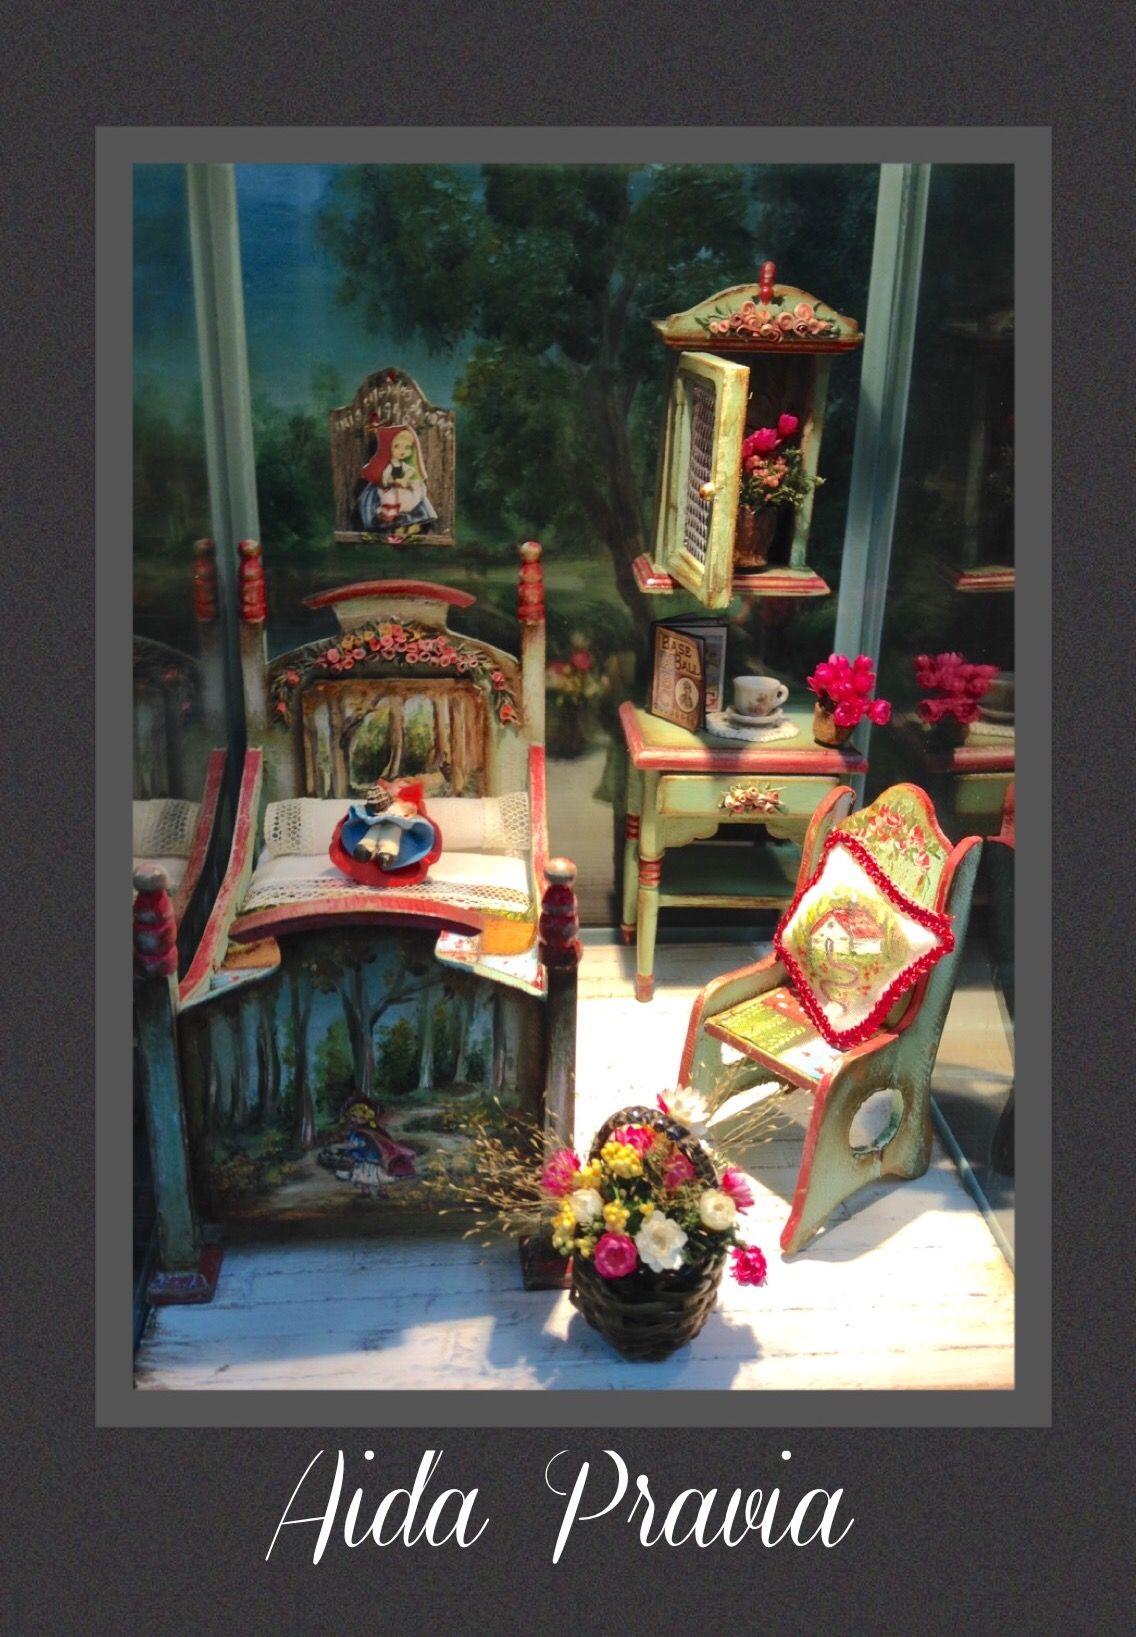 Dollhouse 1 12 By Aida Pravia Las Miniaturas De Aida Pravia  # Muebles Cuento De Hadas